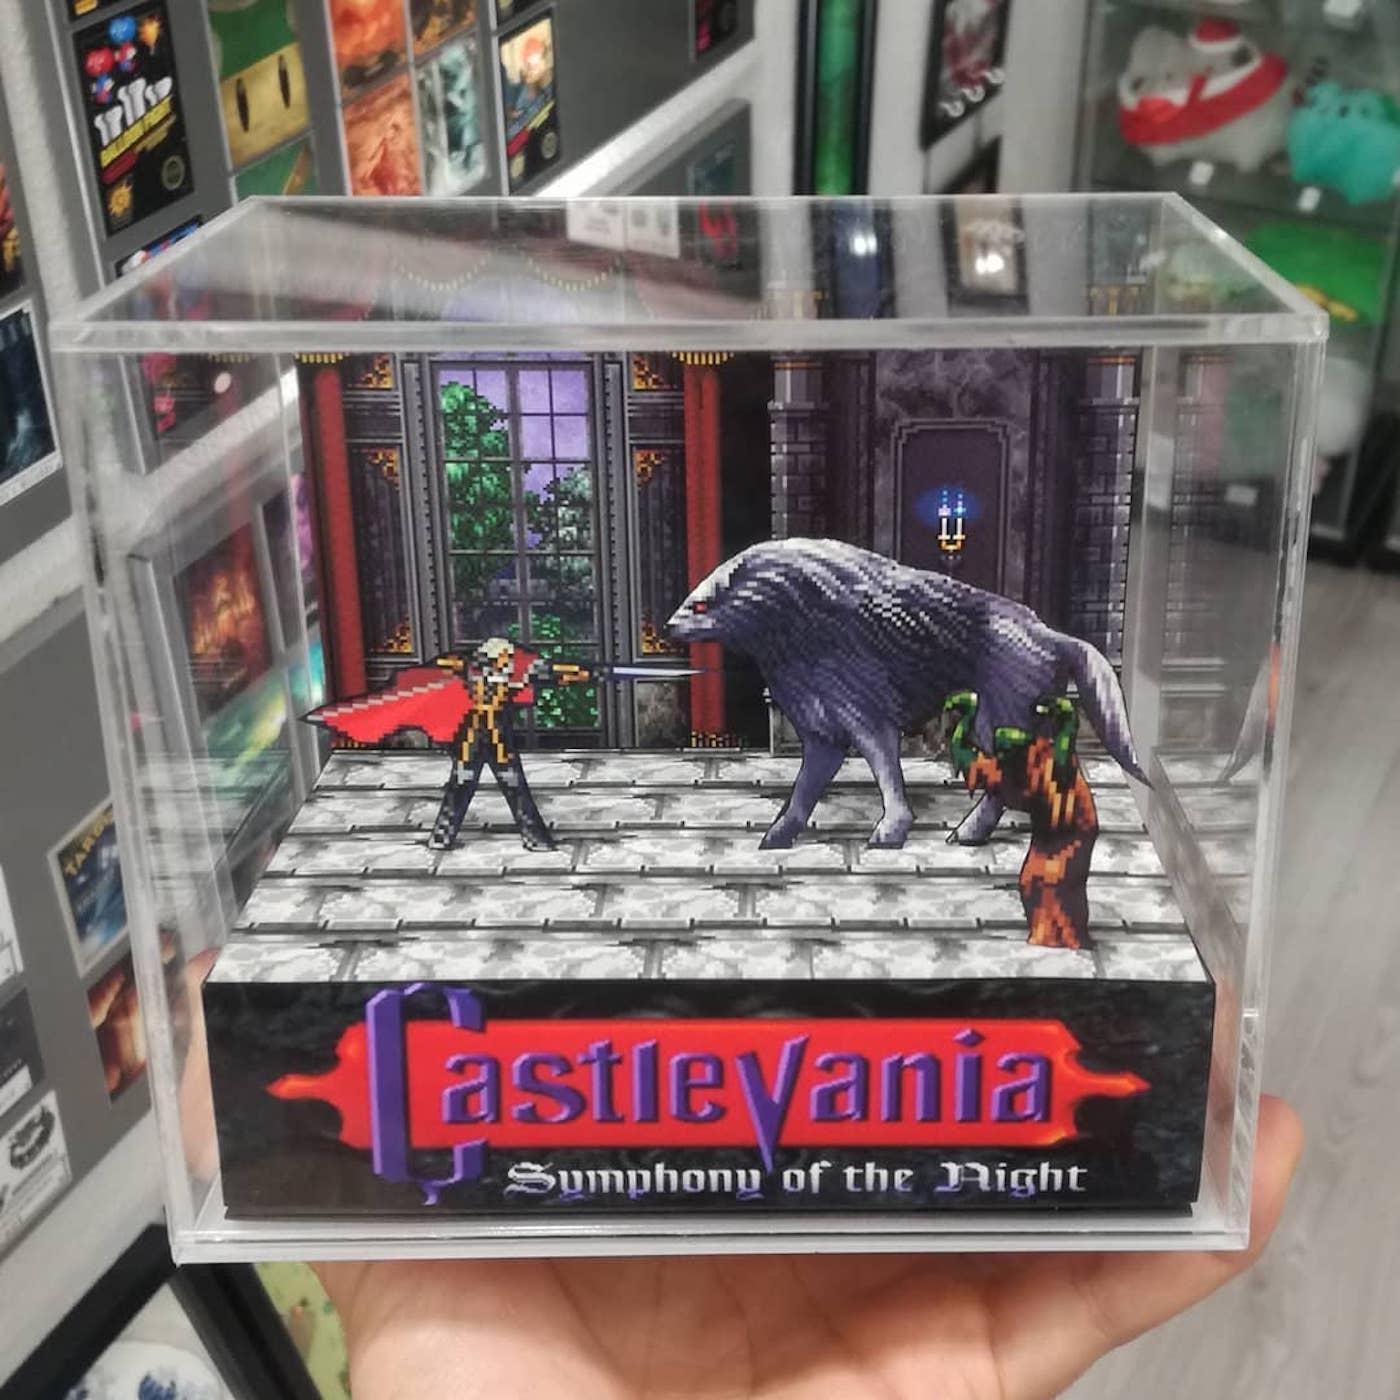 Les merveilles de ARTSMD Arts-md-diorama-cubes-jeux-retro-gameboy-21